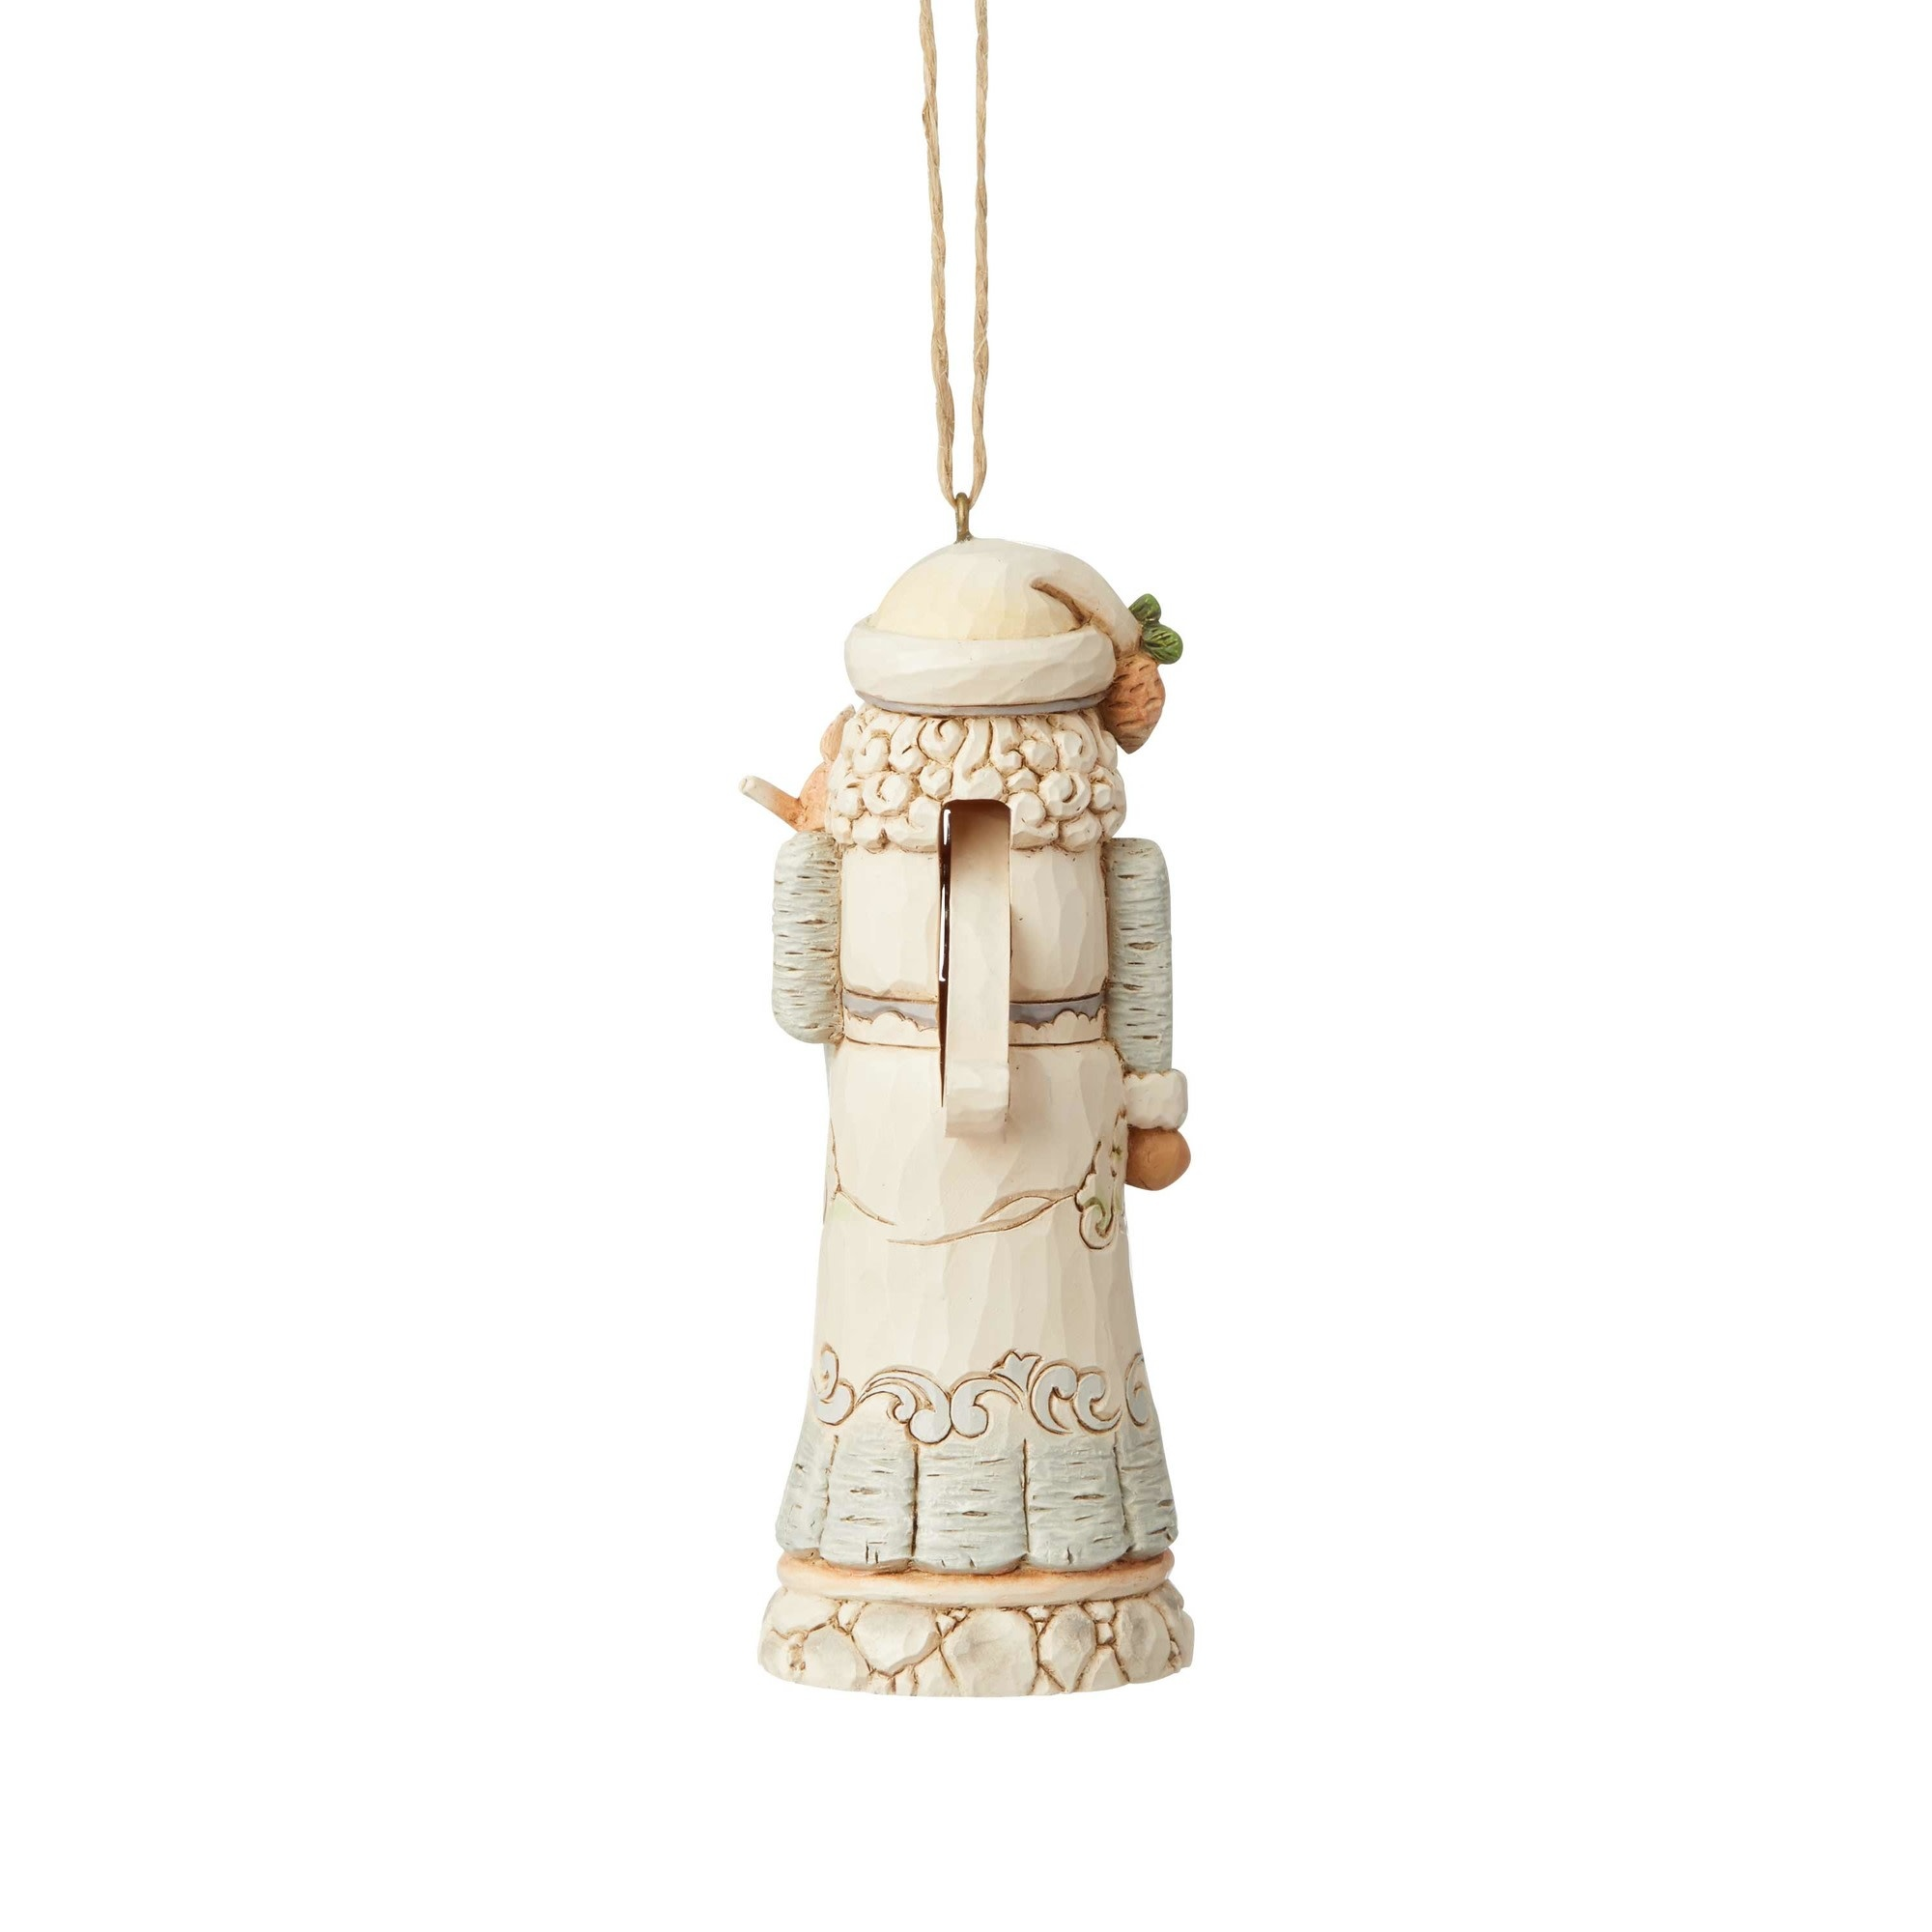 Jim Shore Woodland Nutcracker Ornament